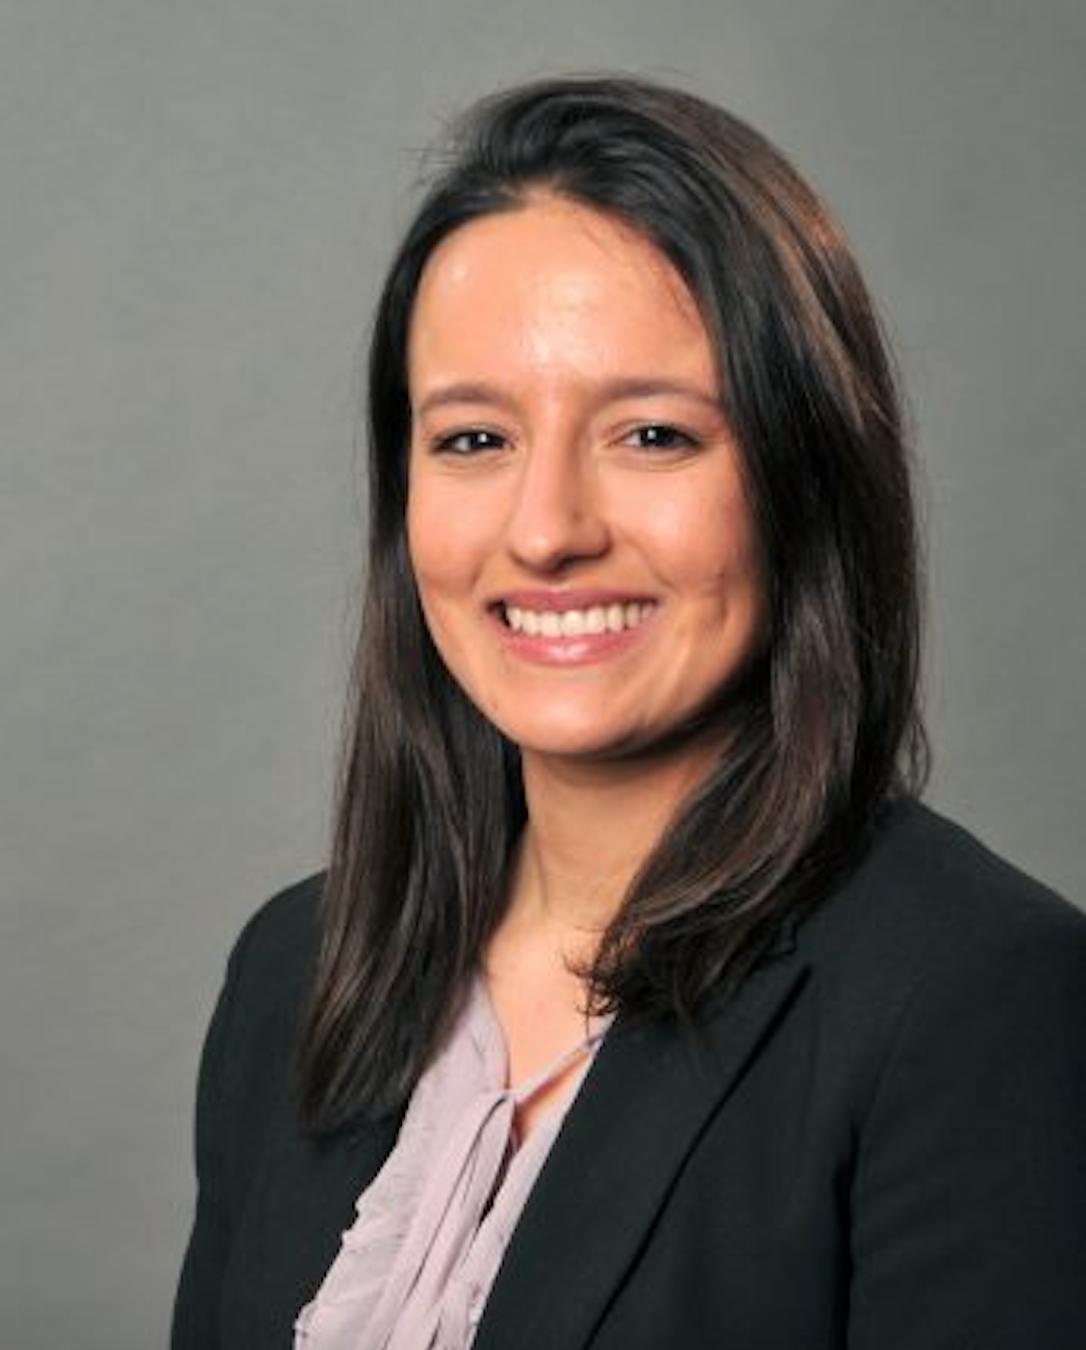 Gabrielle D. Ramos-Solomon, Newark Public Schools